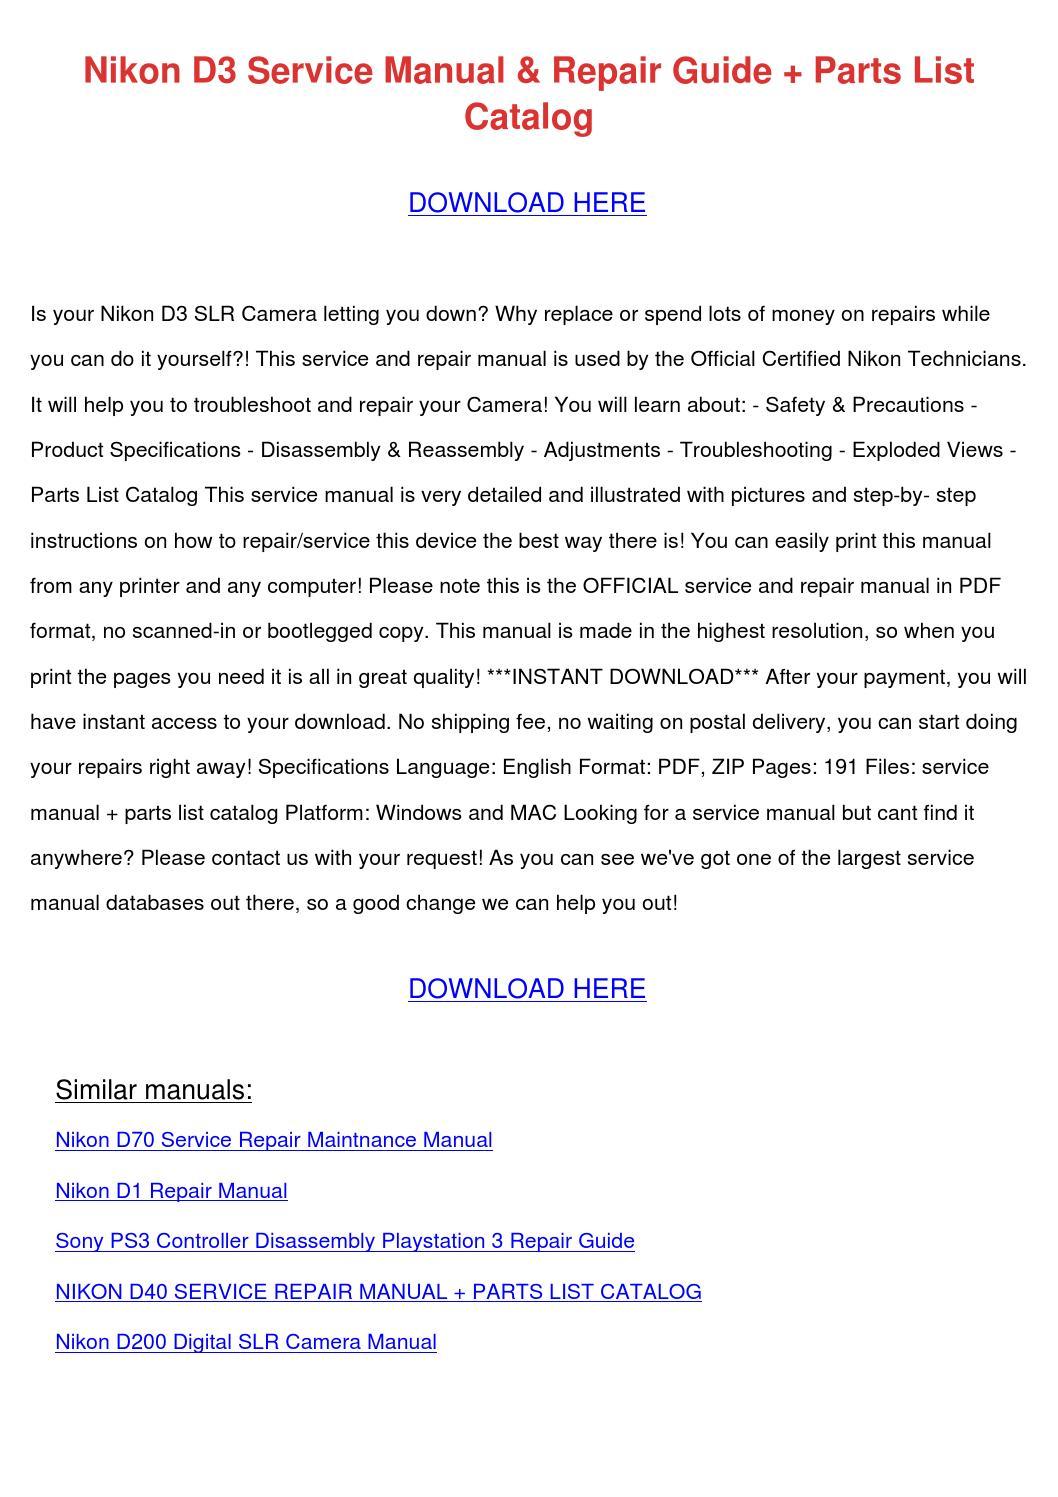 Nikon D3 Service Manual Repair Guide Parts Li by PatriciaOrton - issuu